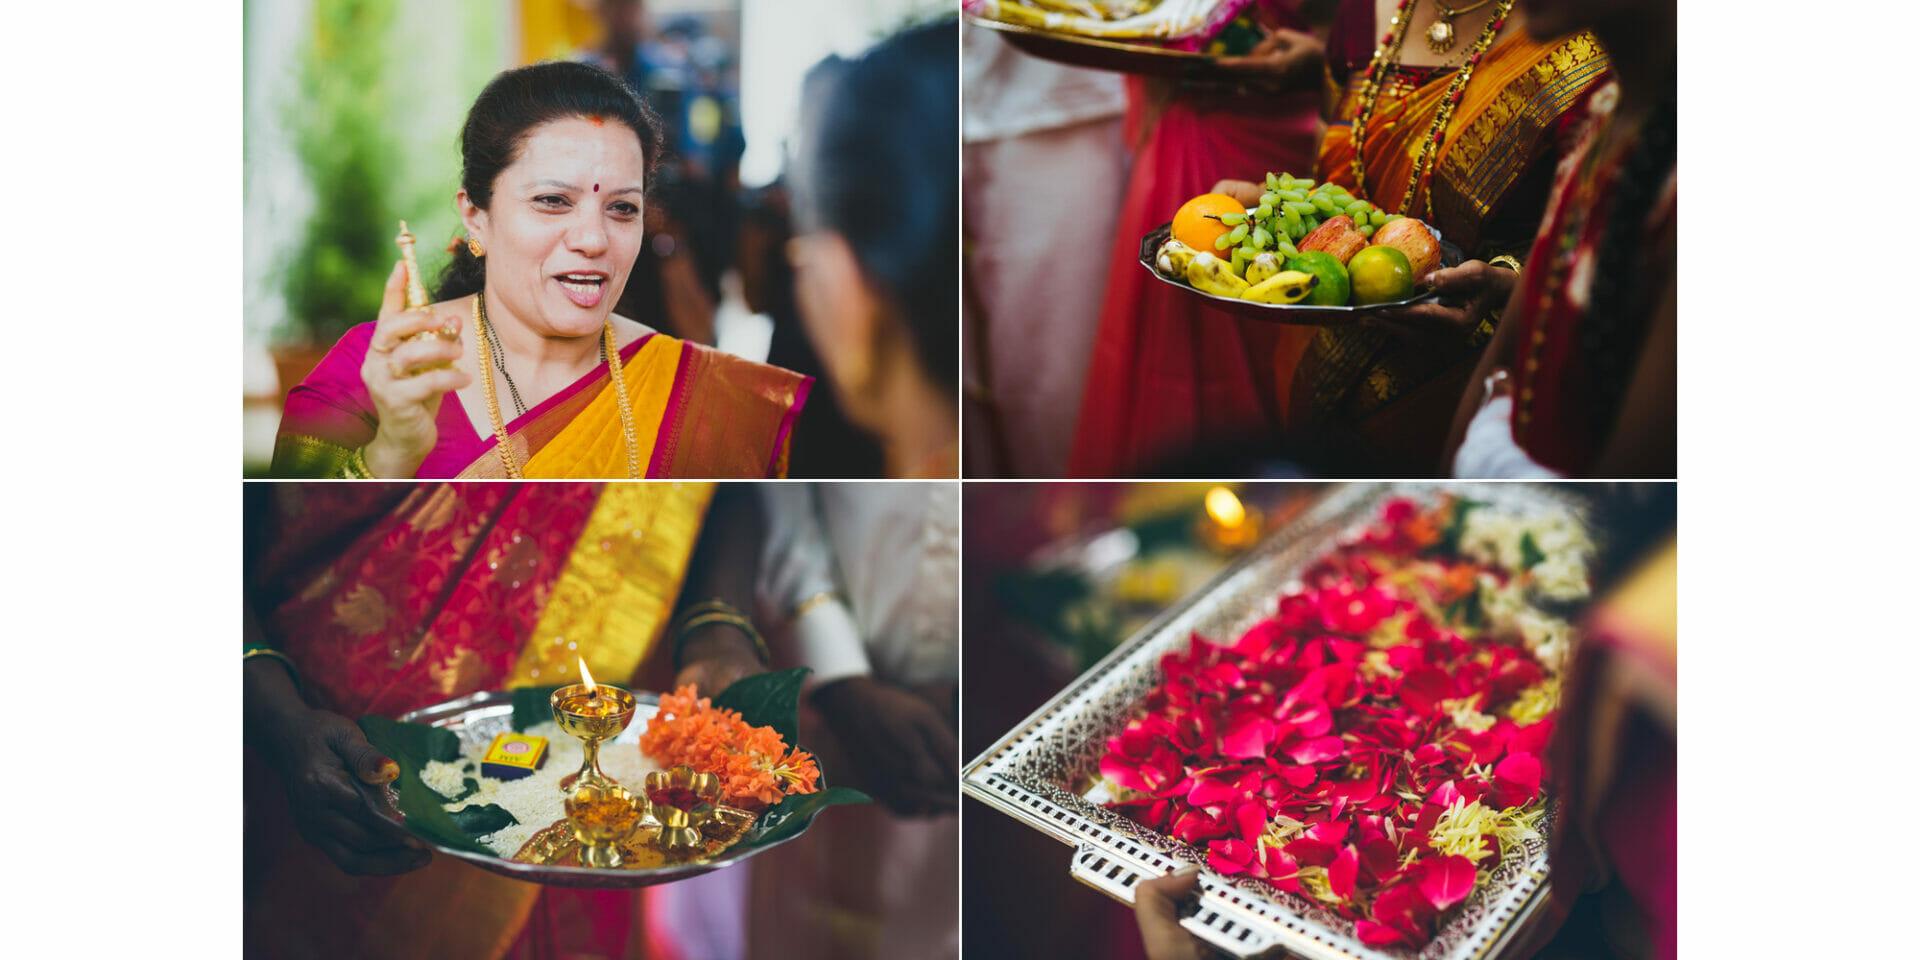 shruti annayya sree vikash photography wedding kalathur gardens 10